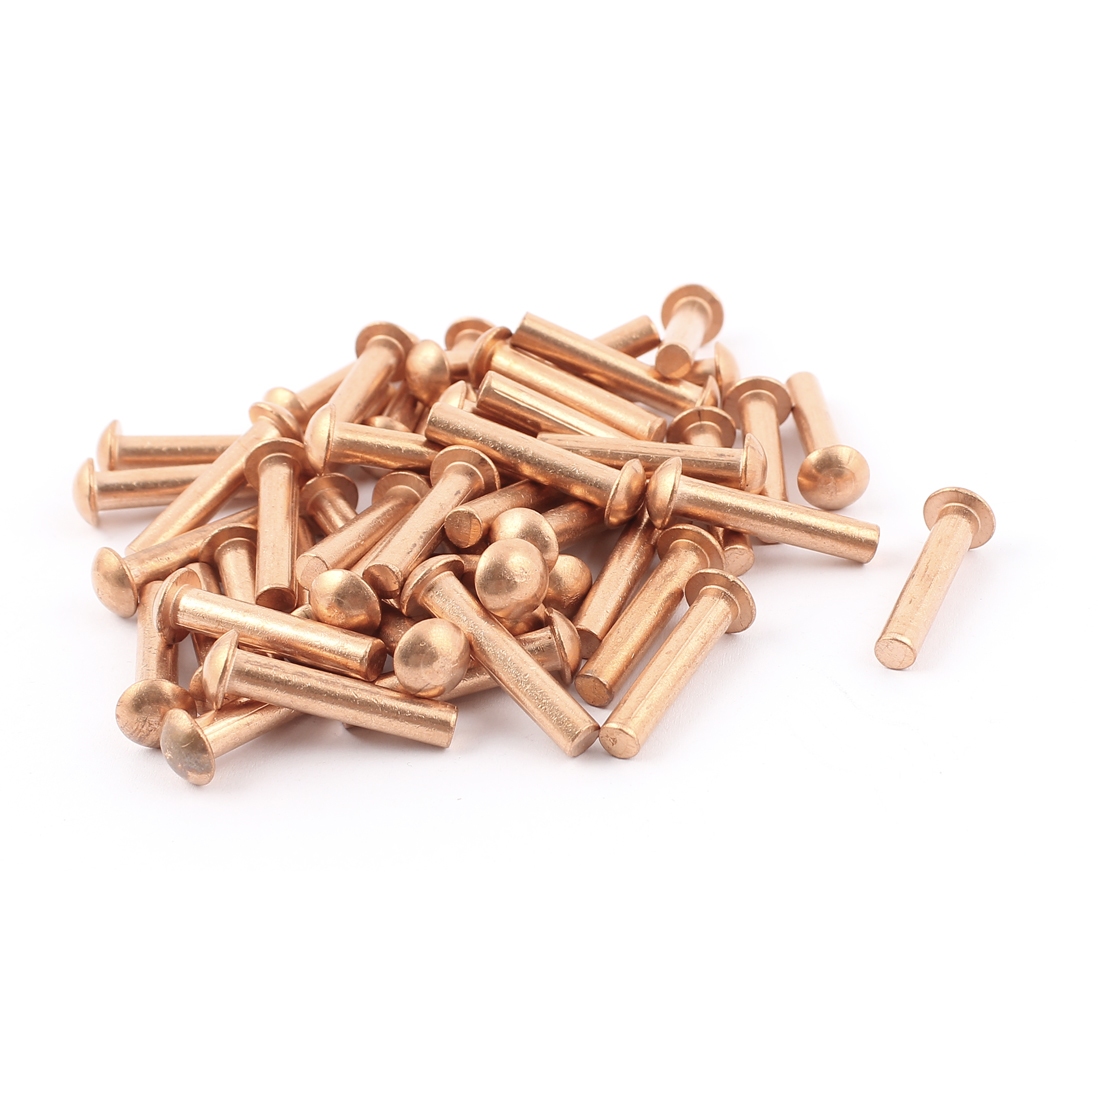 "50 Pcs 3/16"" Diameter 1"" L Shank Round Head Copper Solid Rivets Fasteners"